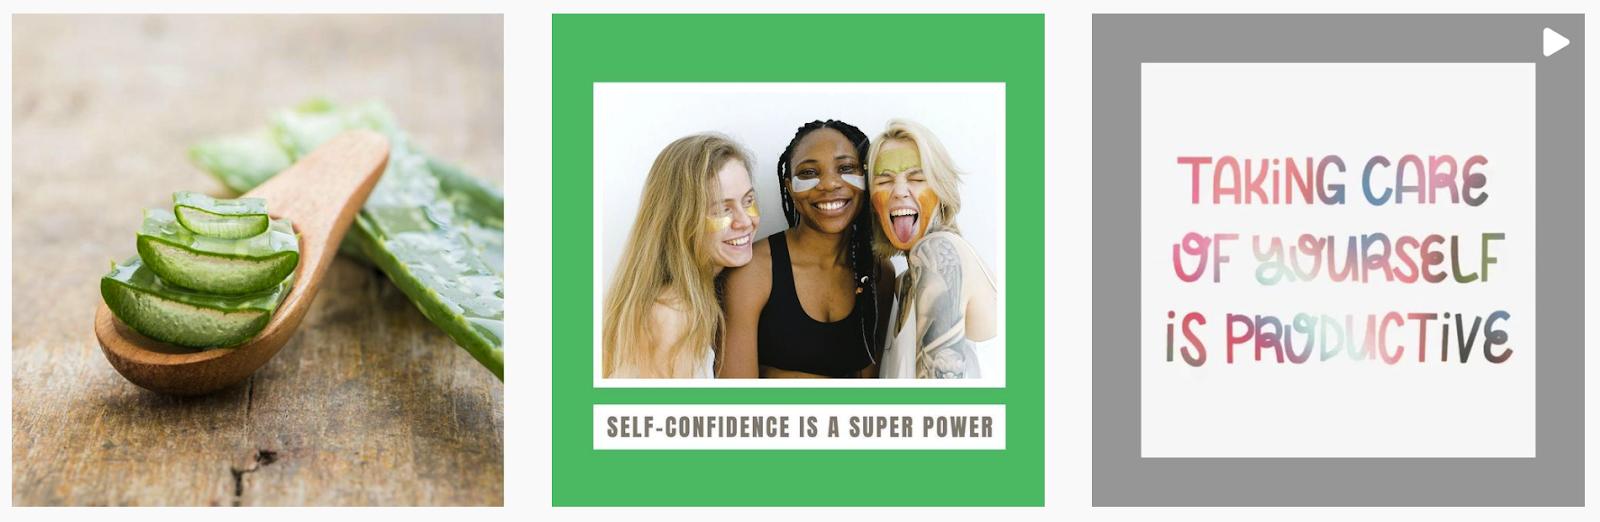 Kay CBD Skincare   Instagram Posts   Skincare Brands Featured on Afluencer